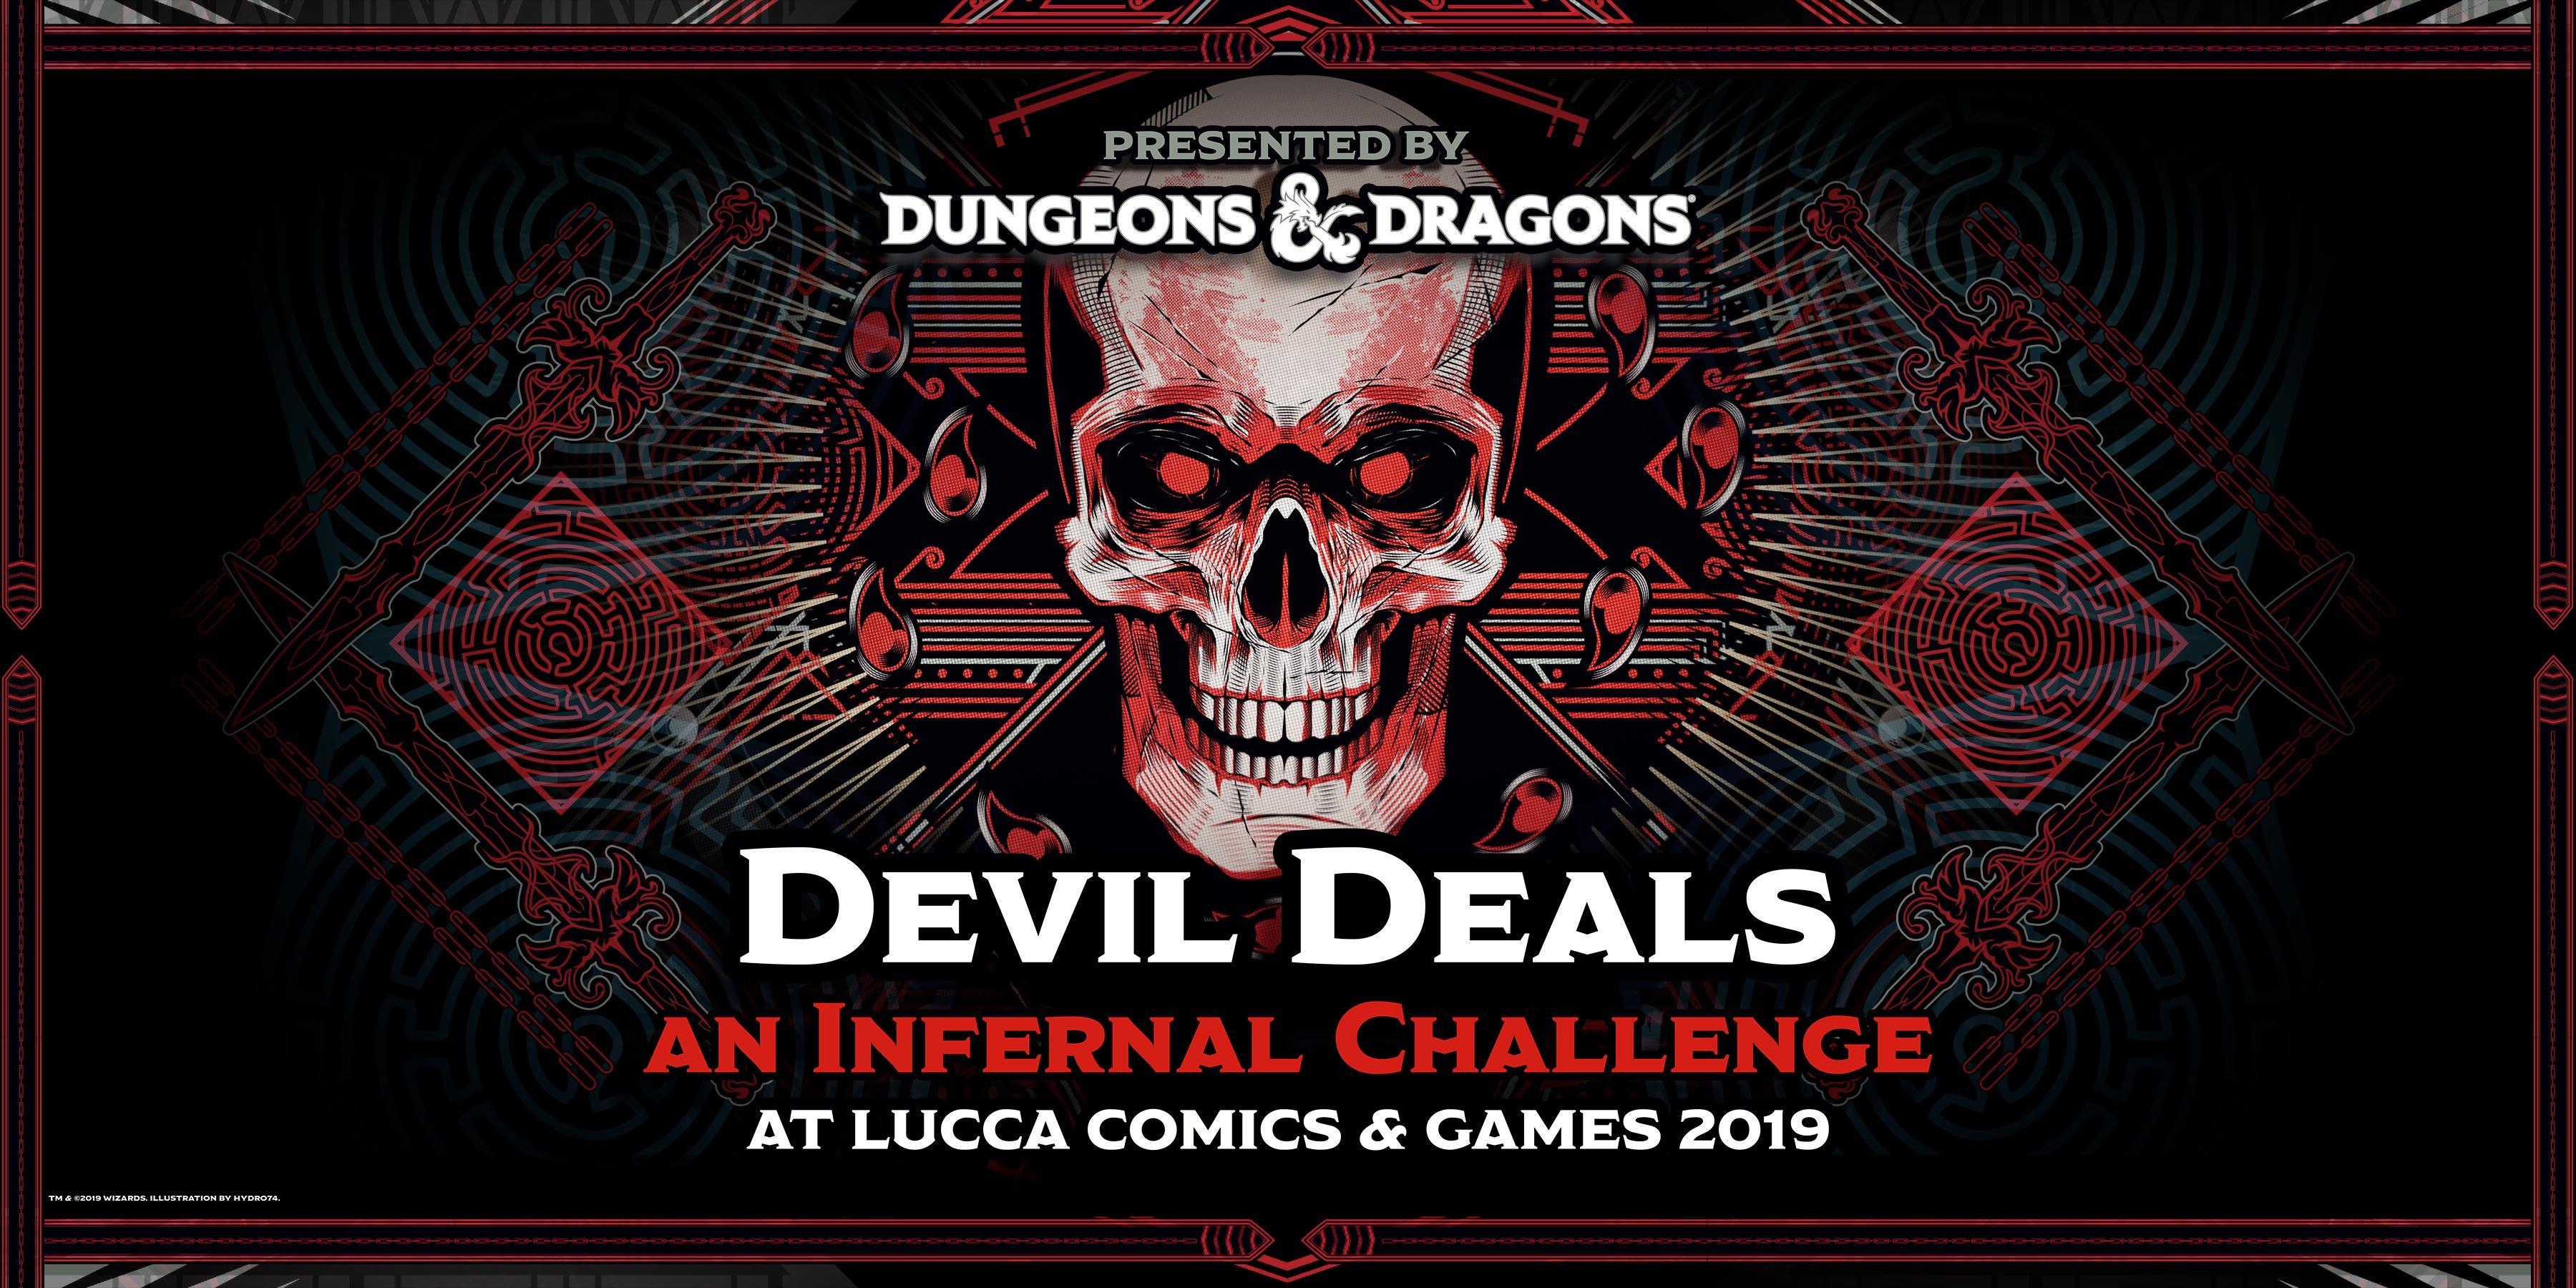 Joe Manganiello ospite a Lucca Comics & Games 2019 per giocare a Dungeons & Dragons dentro al nuovo Dungeon San Colombano